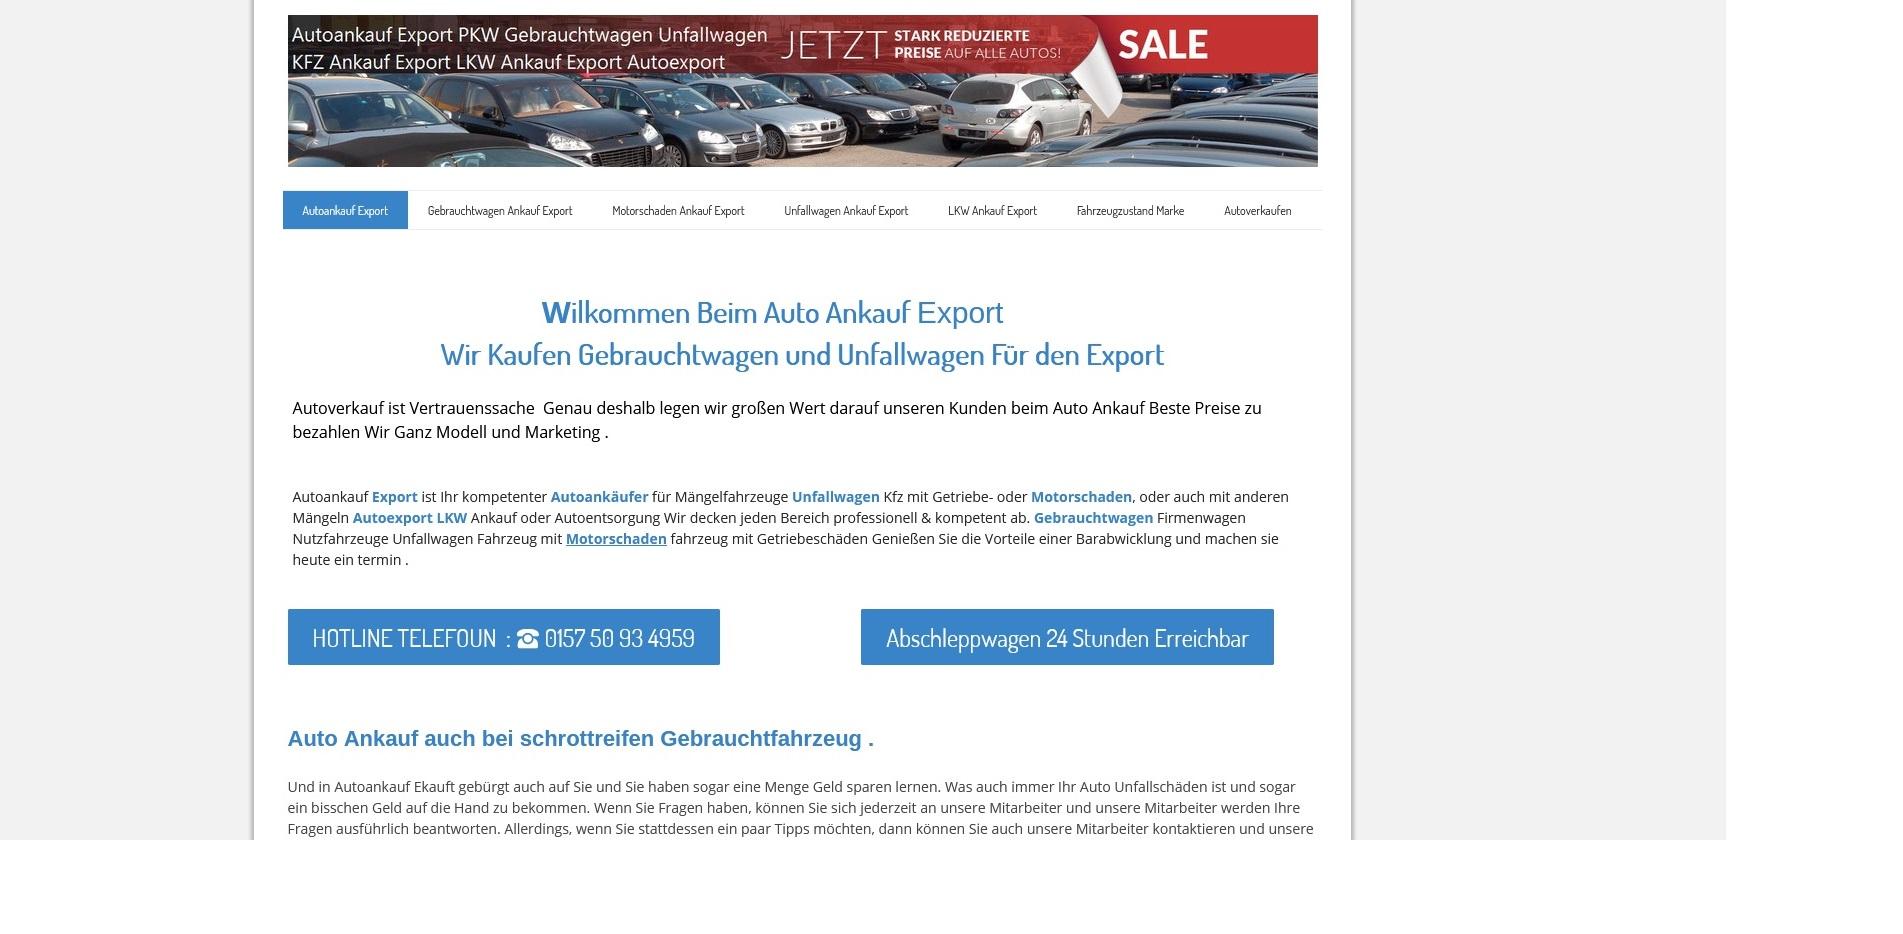 Kfz-Ankauf-export.de | Autoankauf Siegburg | Autoankauf Export Siegburg